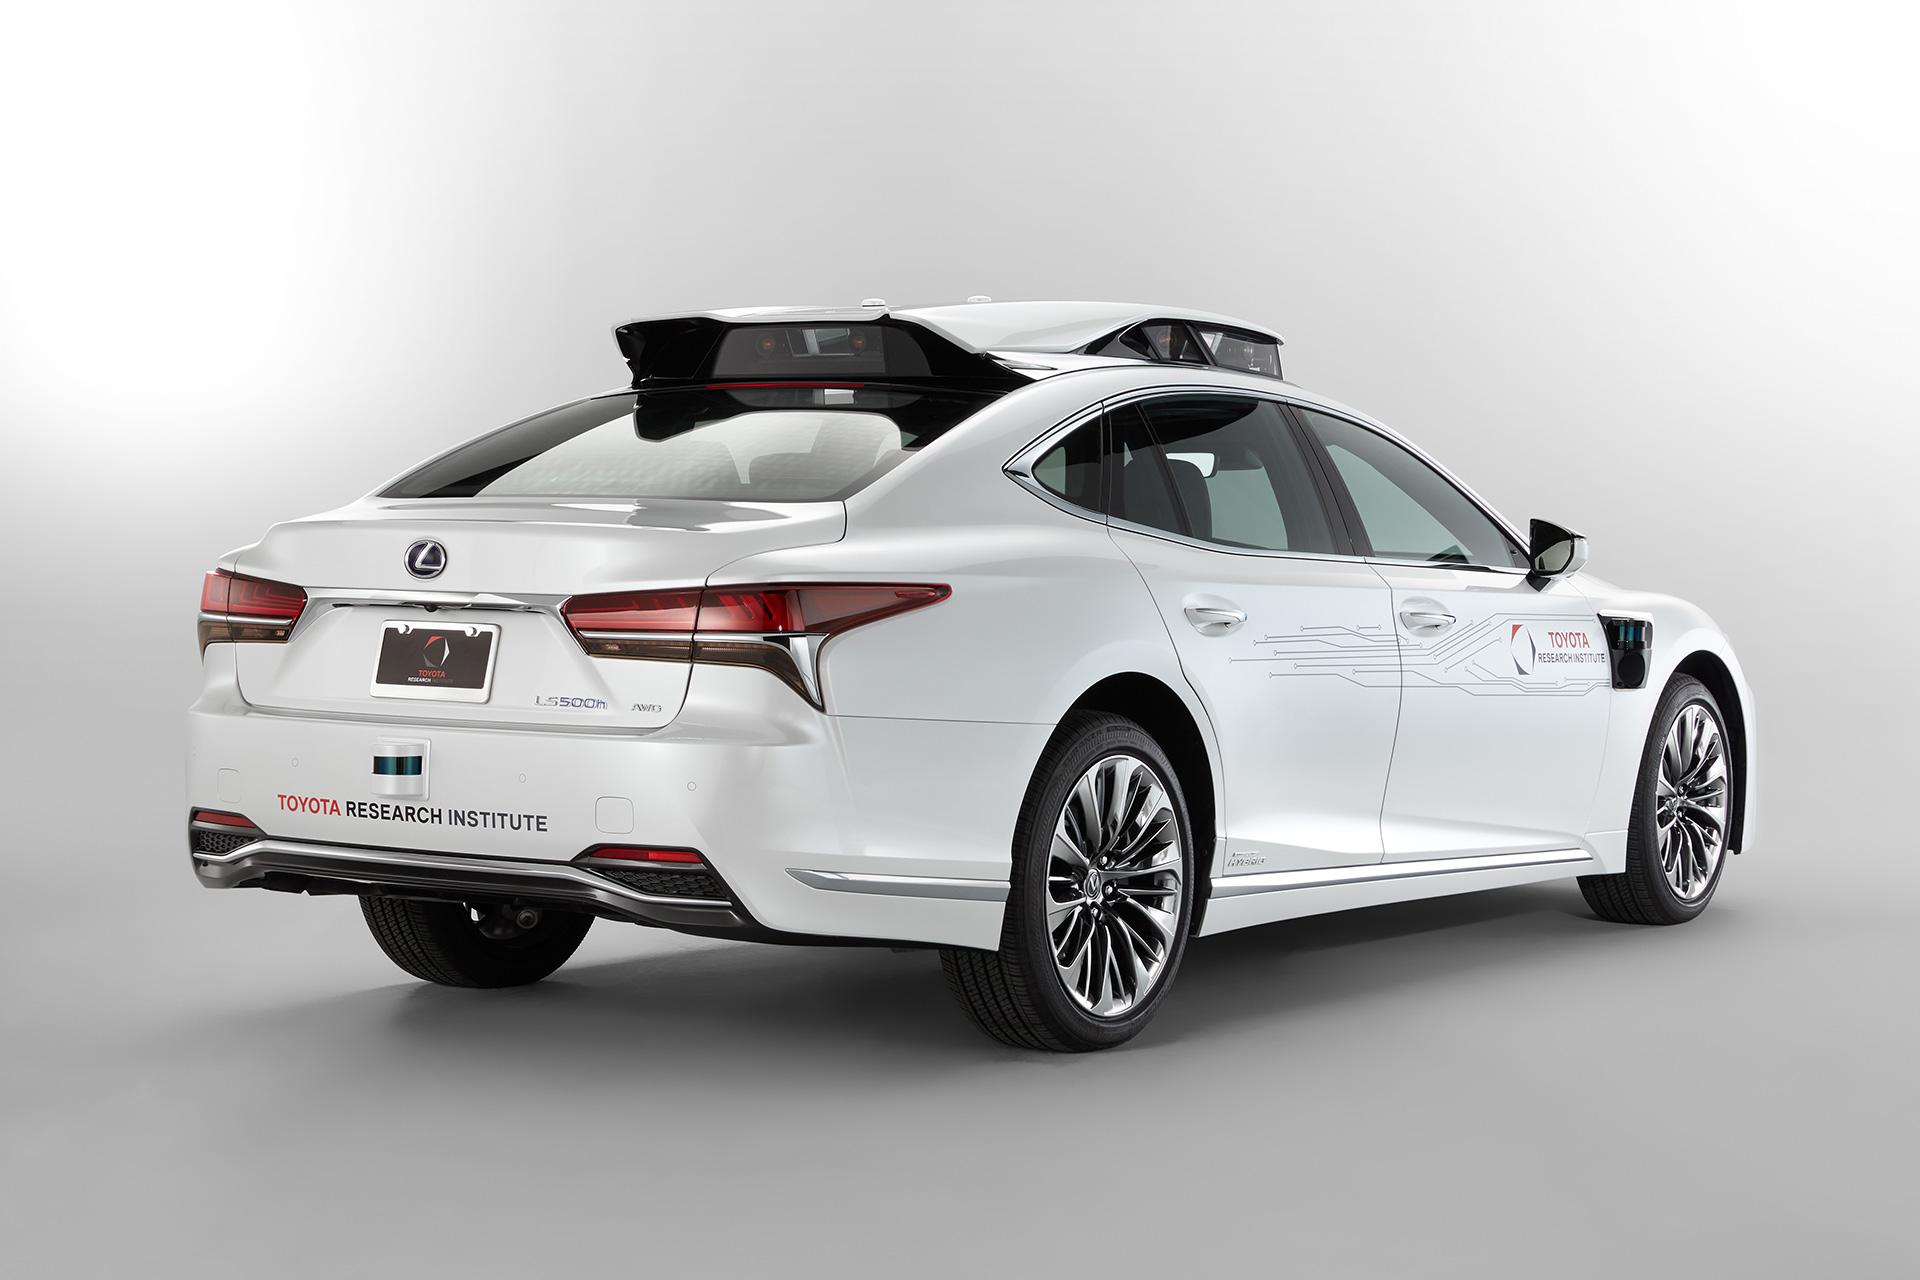 「【CES 2019】新型レクサスLSをベースとした自動運転実験車「TRI-P4」を披露」の9枚目の画像